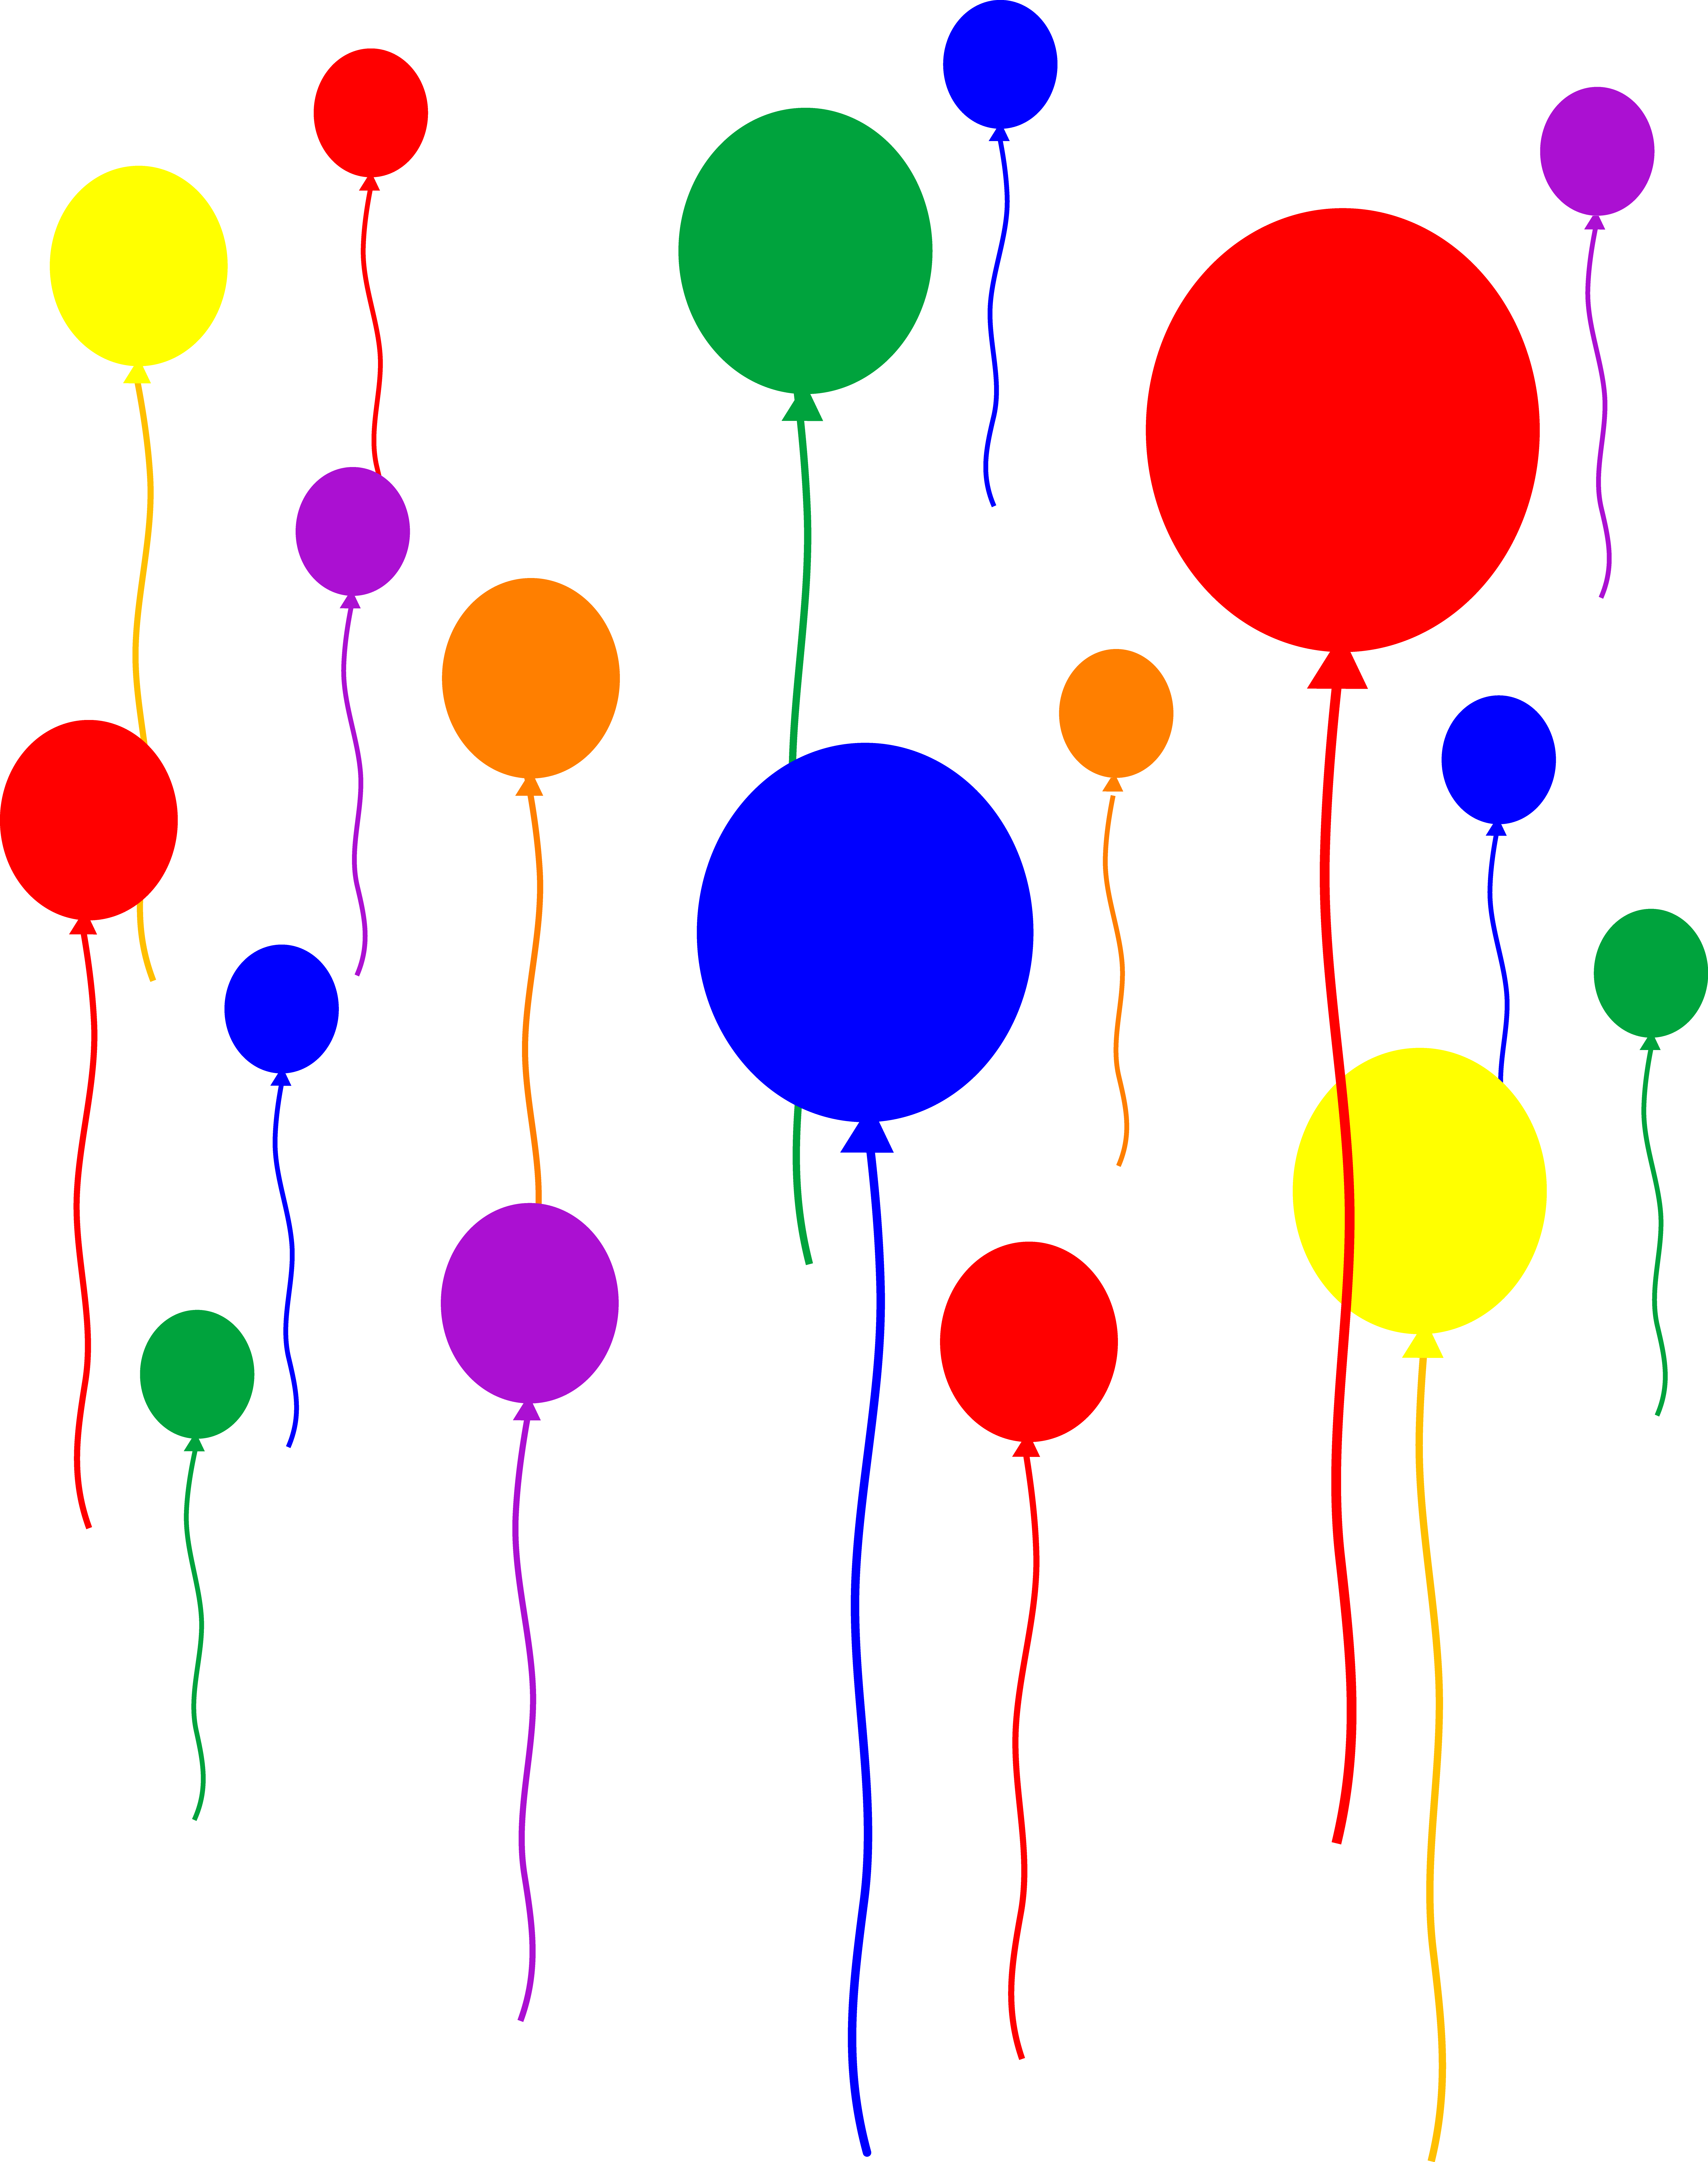 Decoration clipart party balloon Birthday balloons%20clipart Panda Border Free